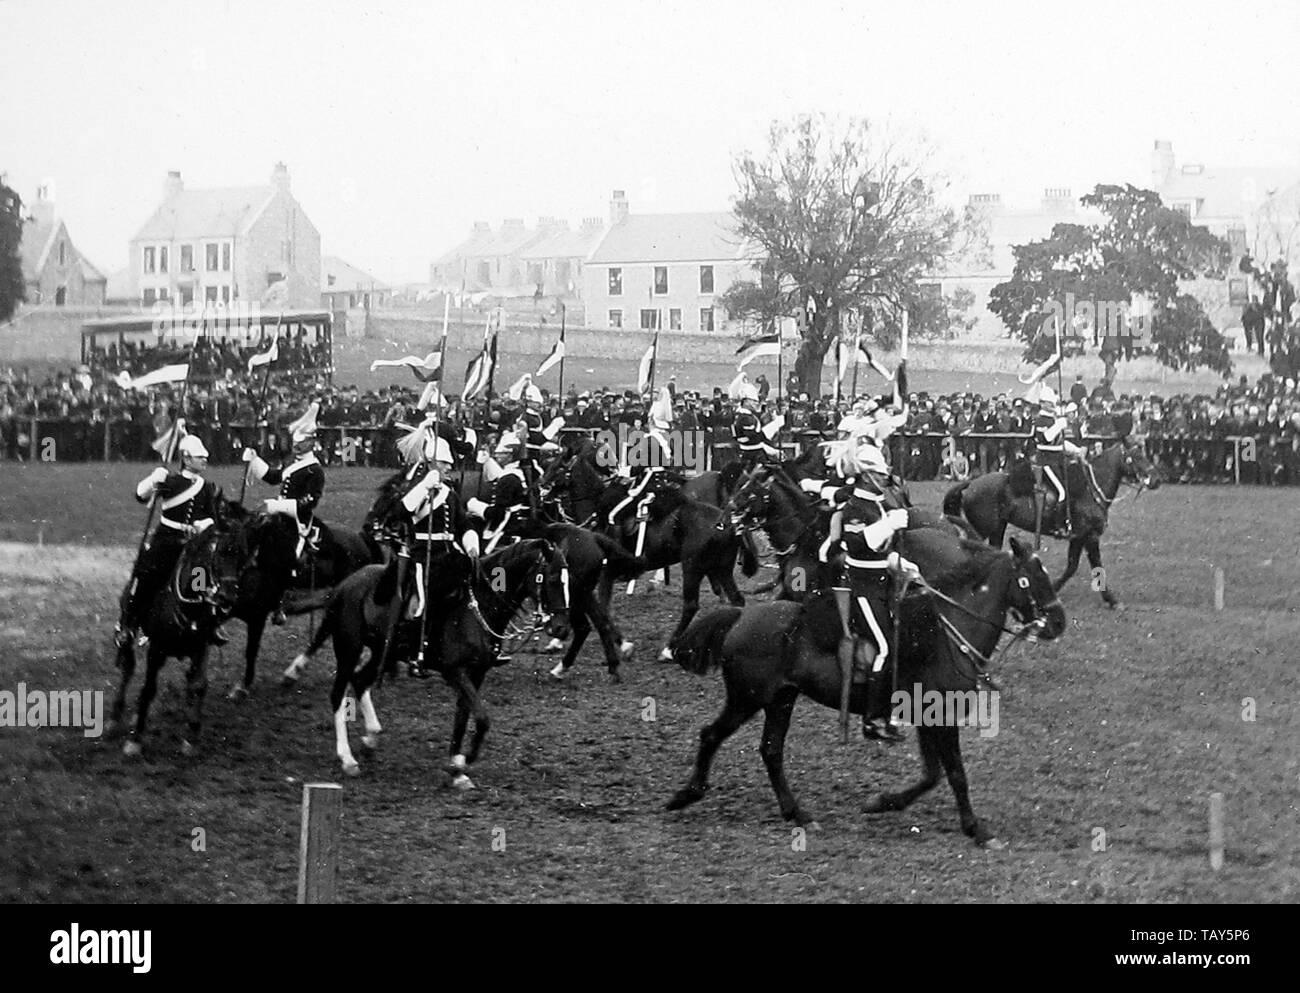 Musical Ride, British Army Cavalry Regiment - Stock Image